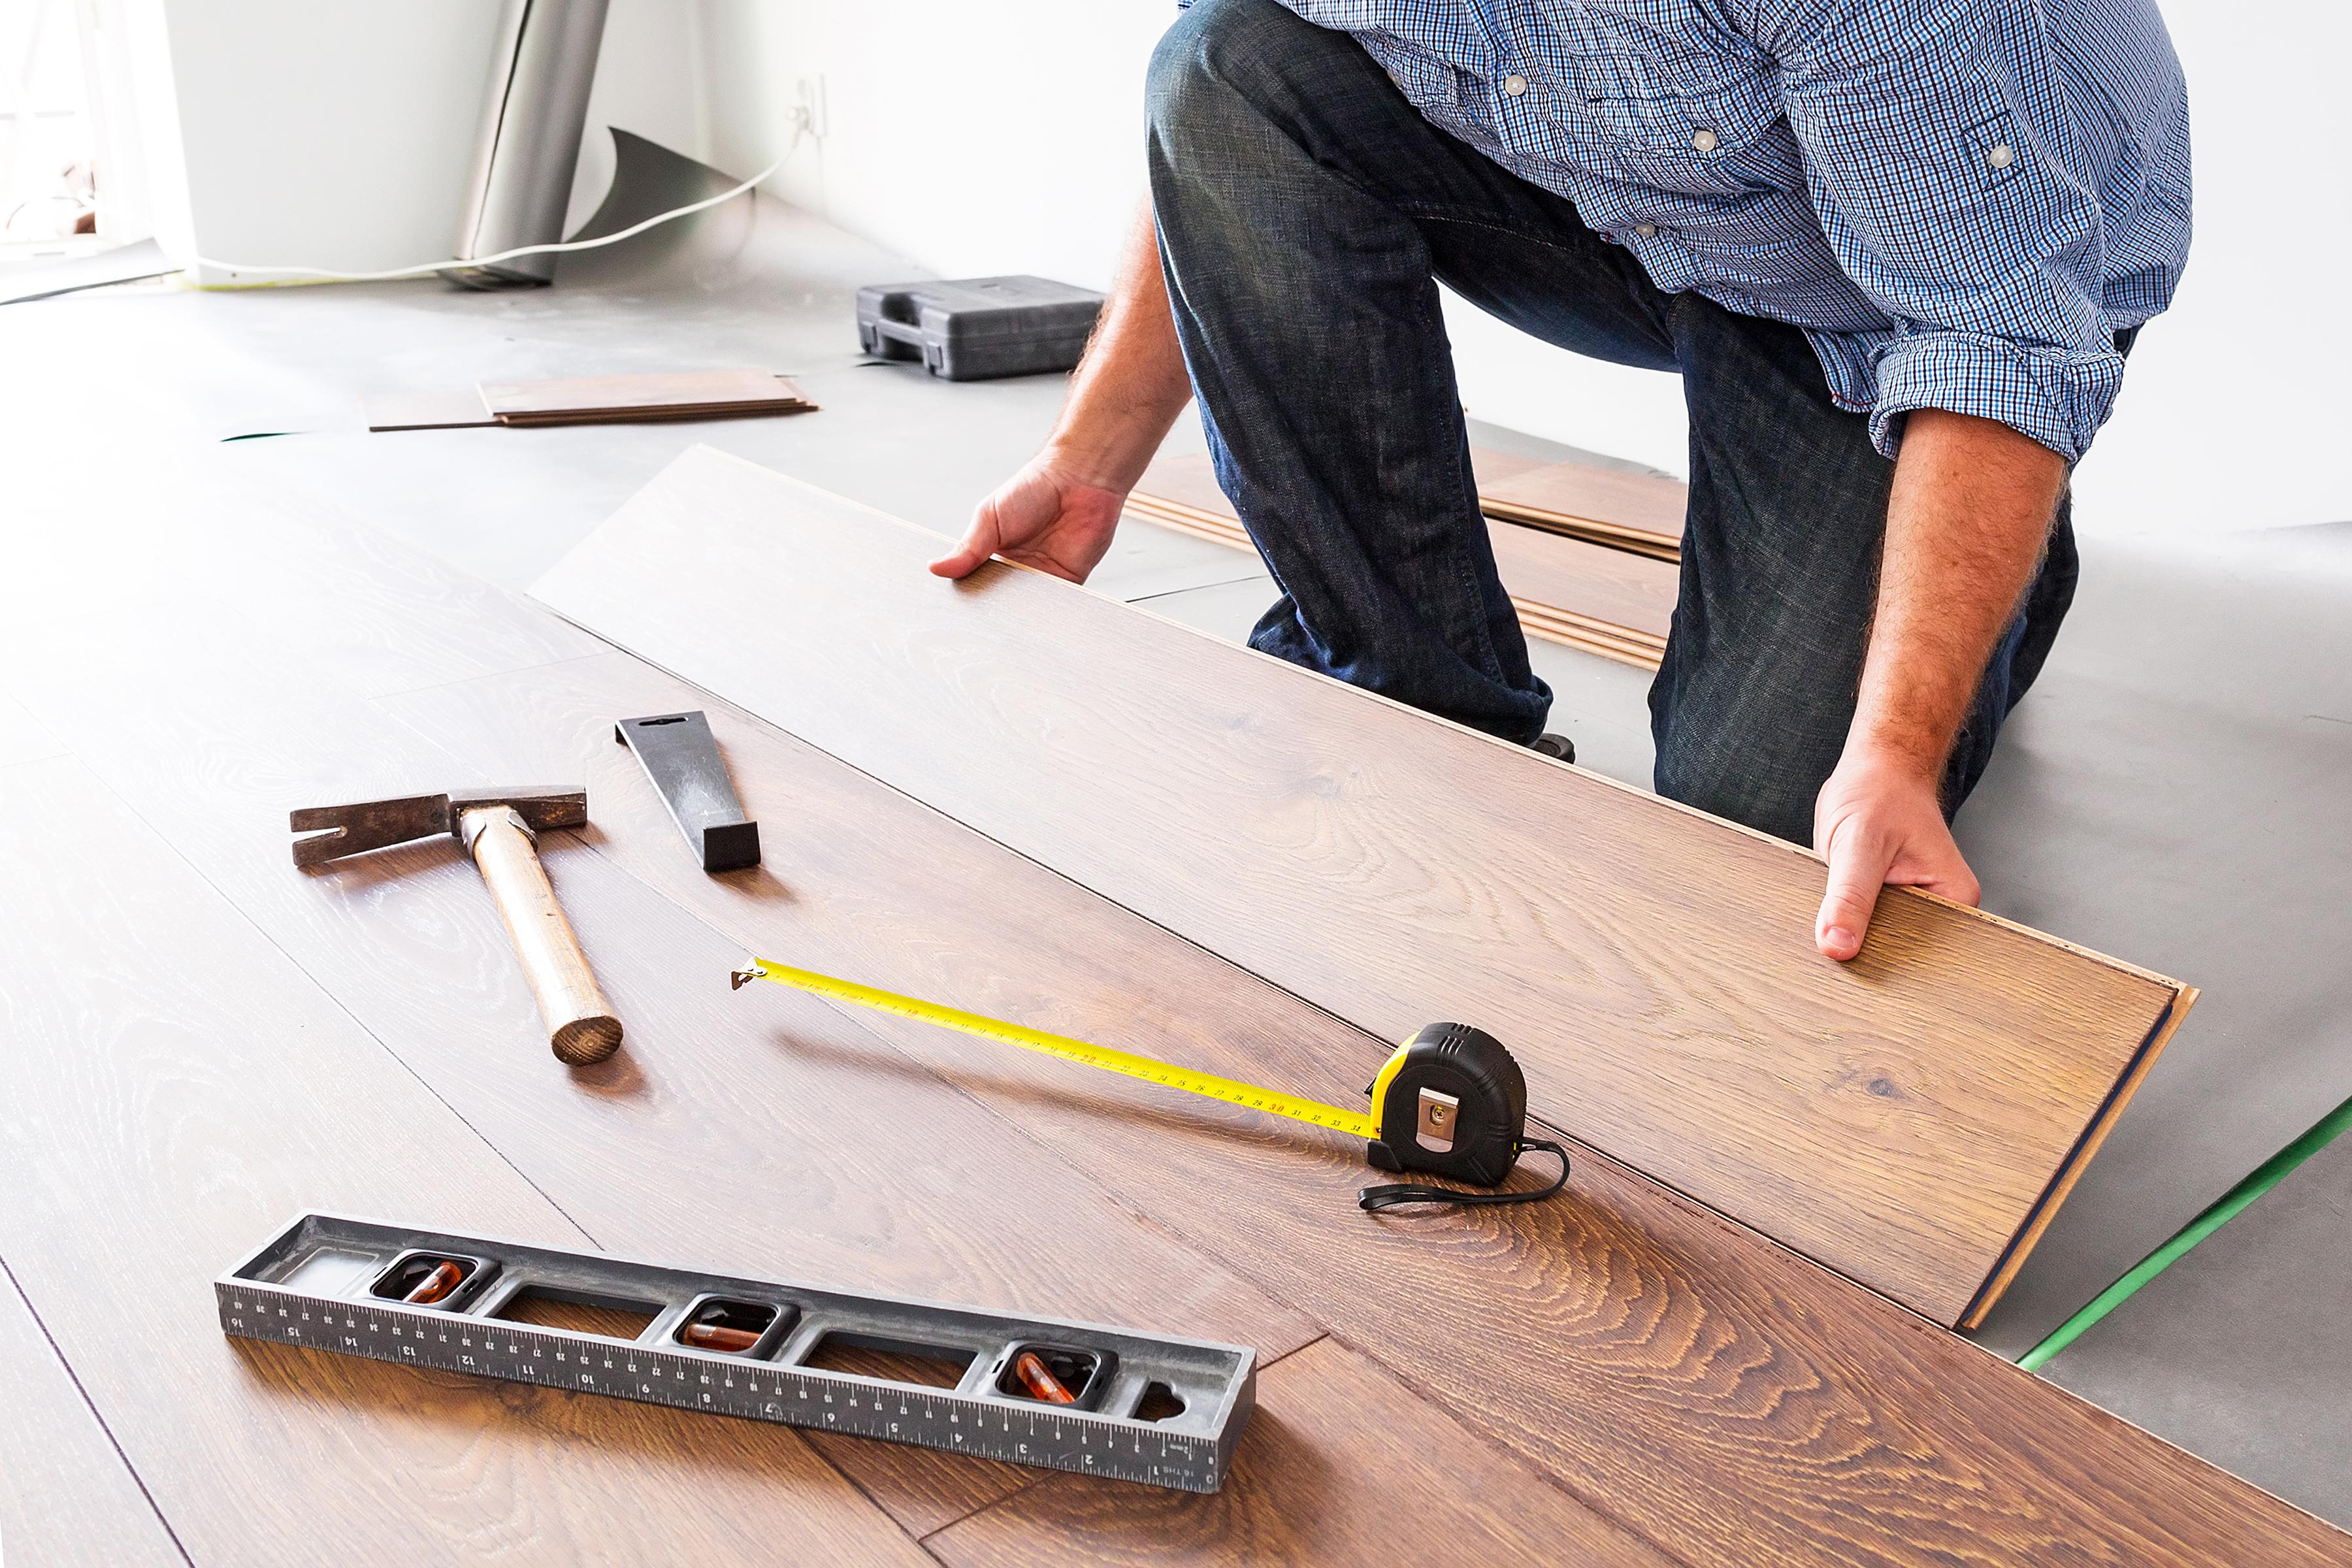 How To Fix Peaking Or Buckling Floors